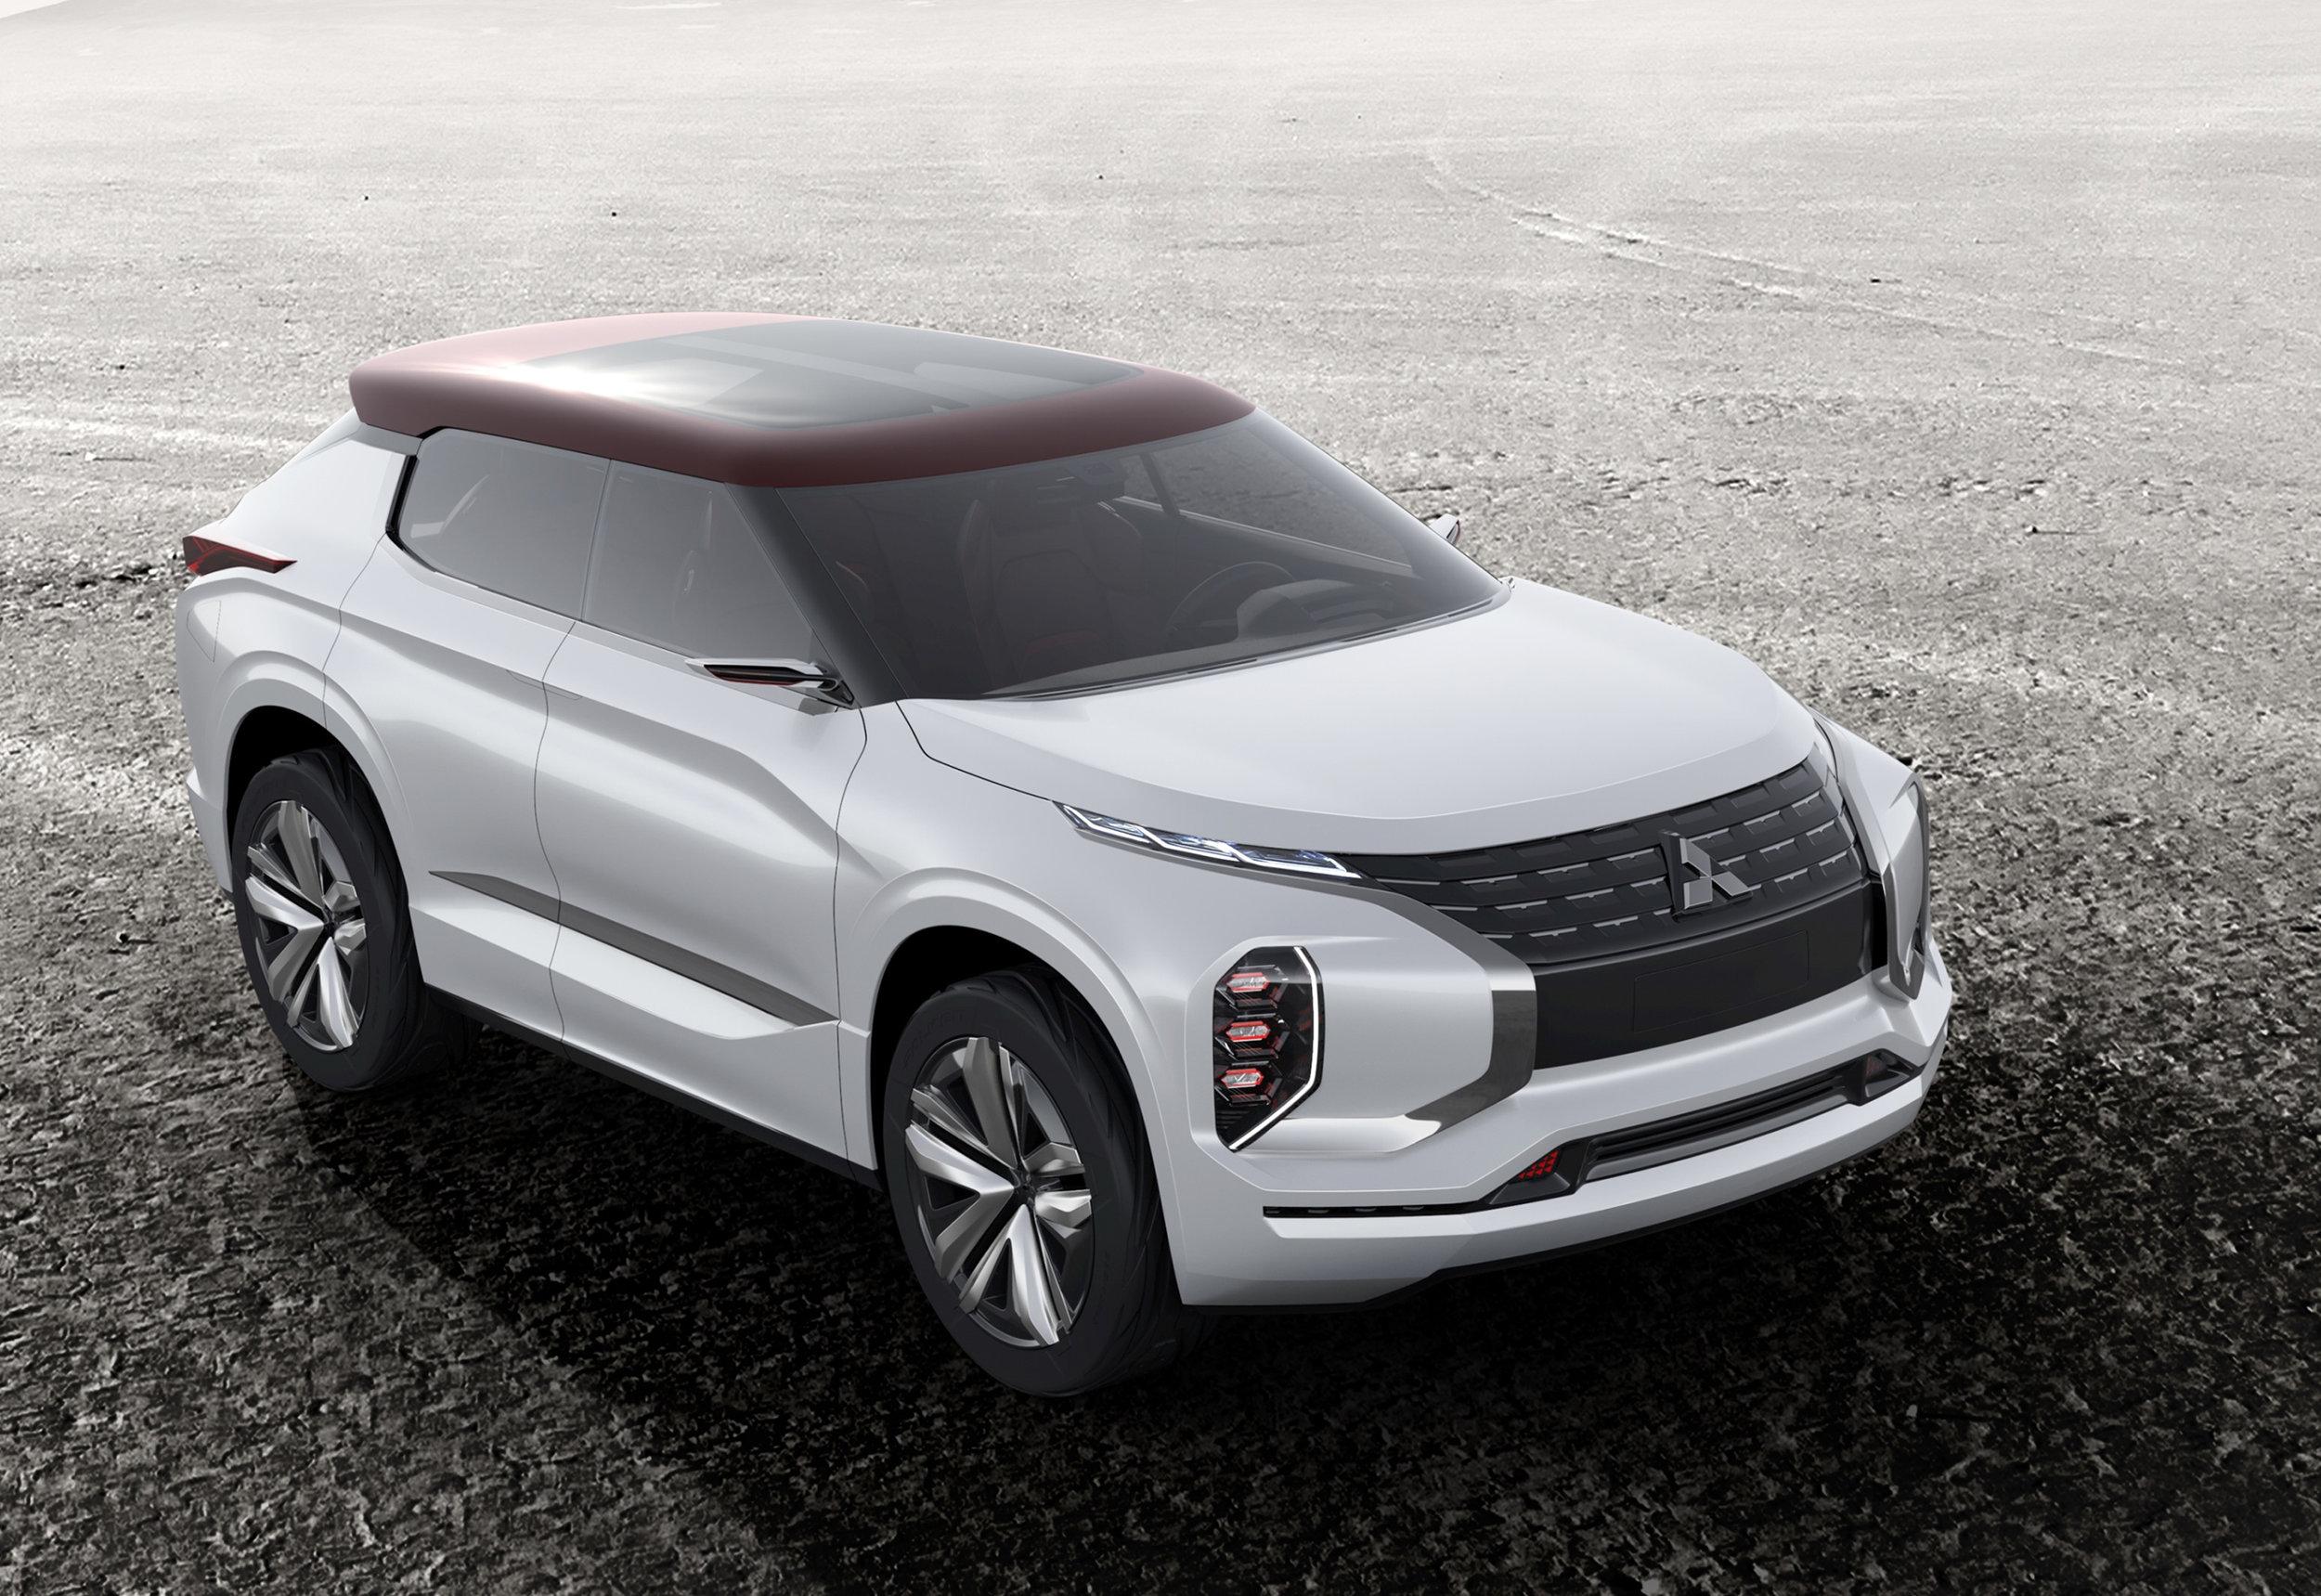 World-Premiere-of-Ground-Tourer-SUV-Mitsubishi-GT-PHEV-Concept.jpg